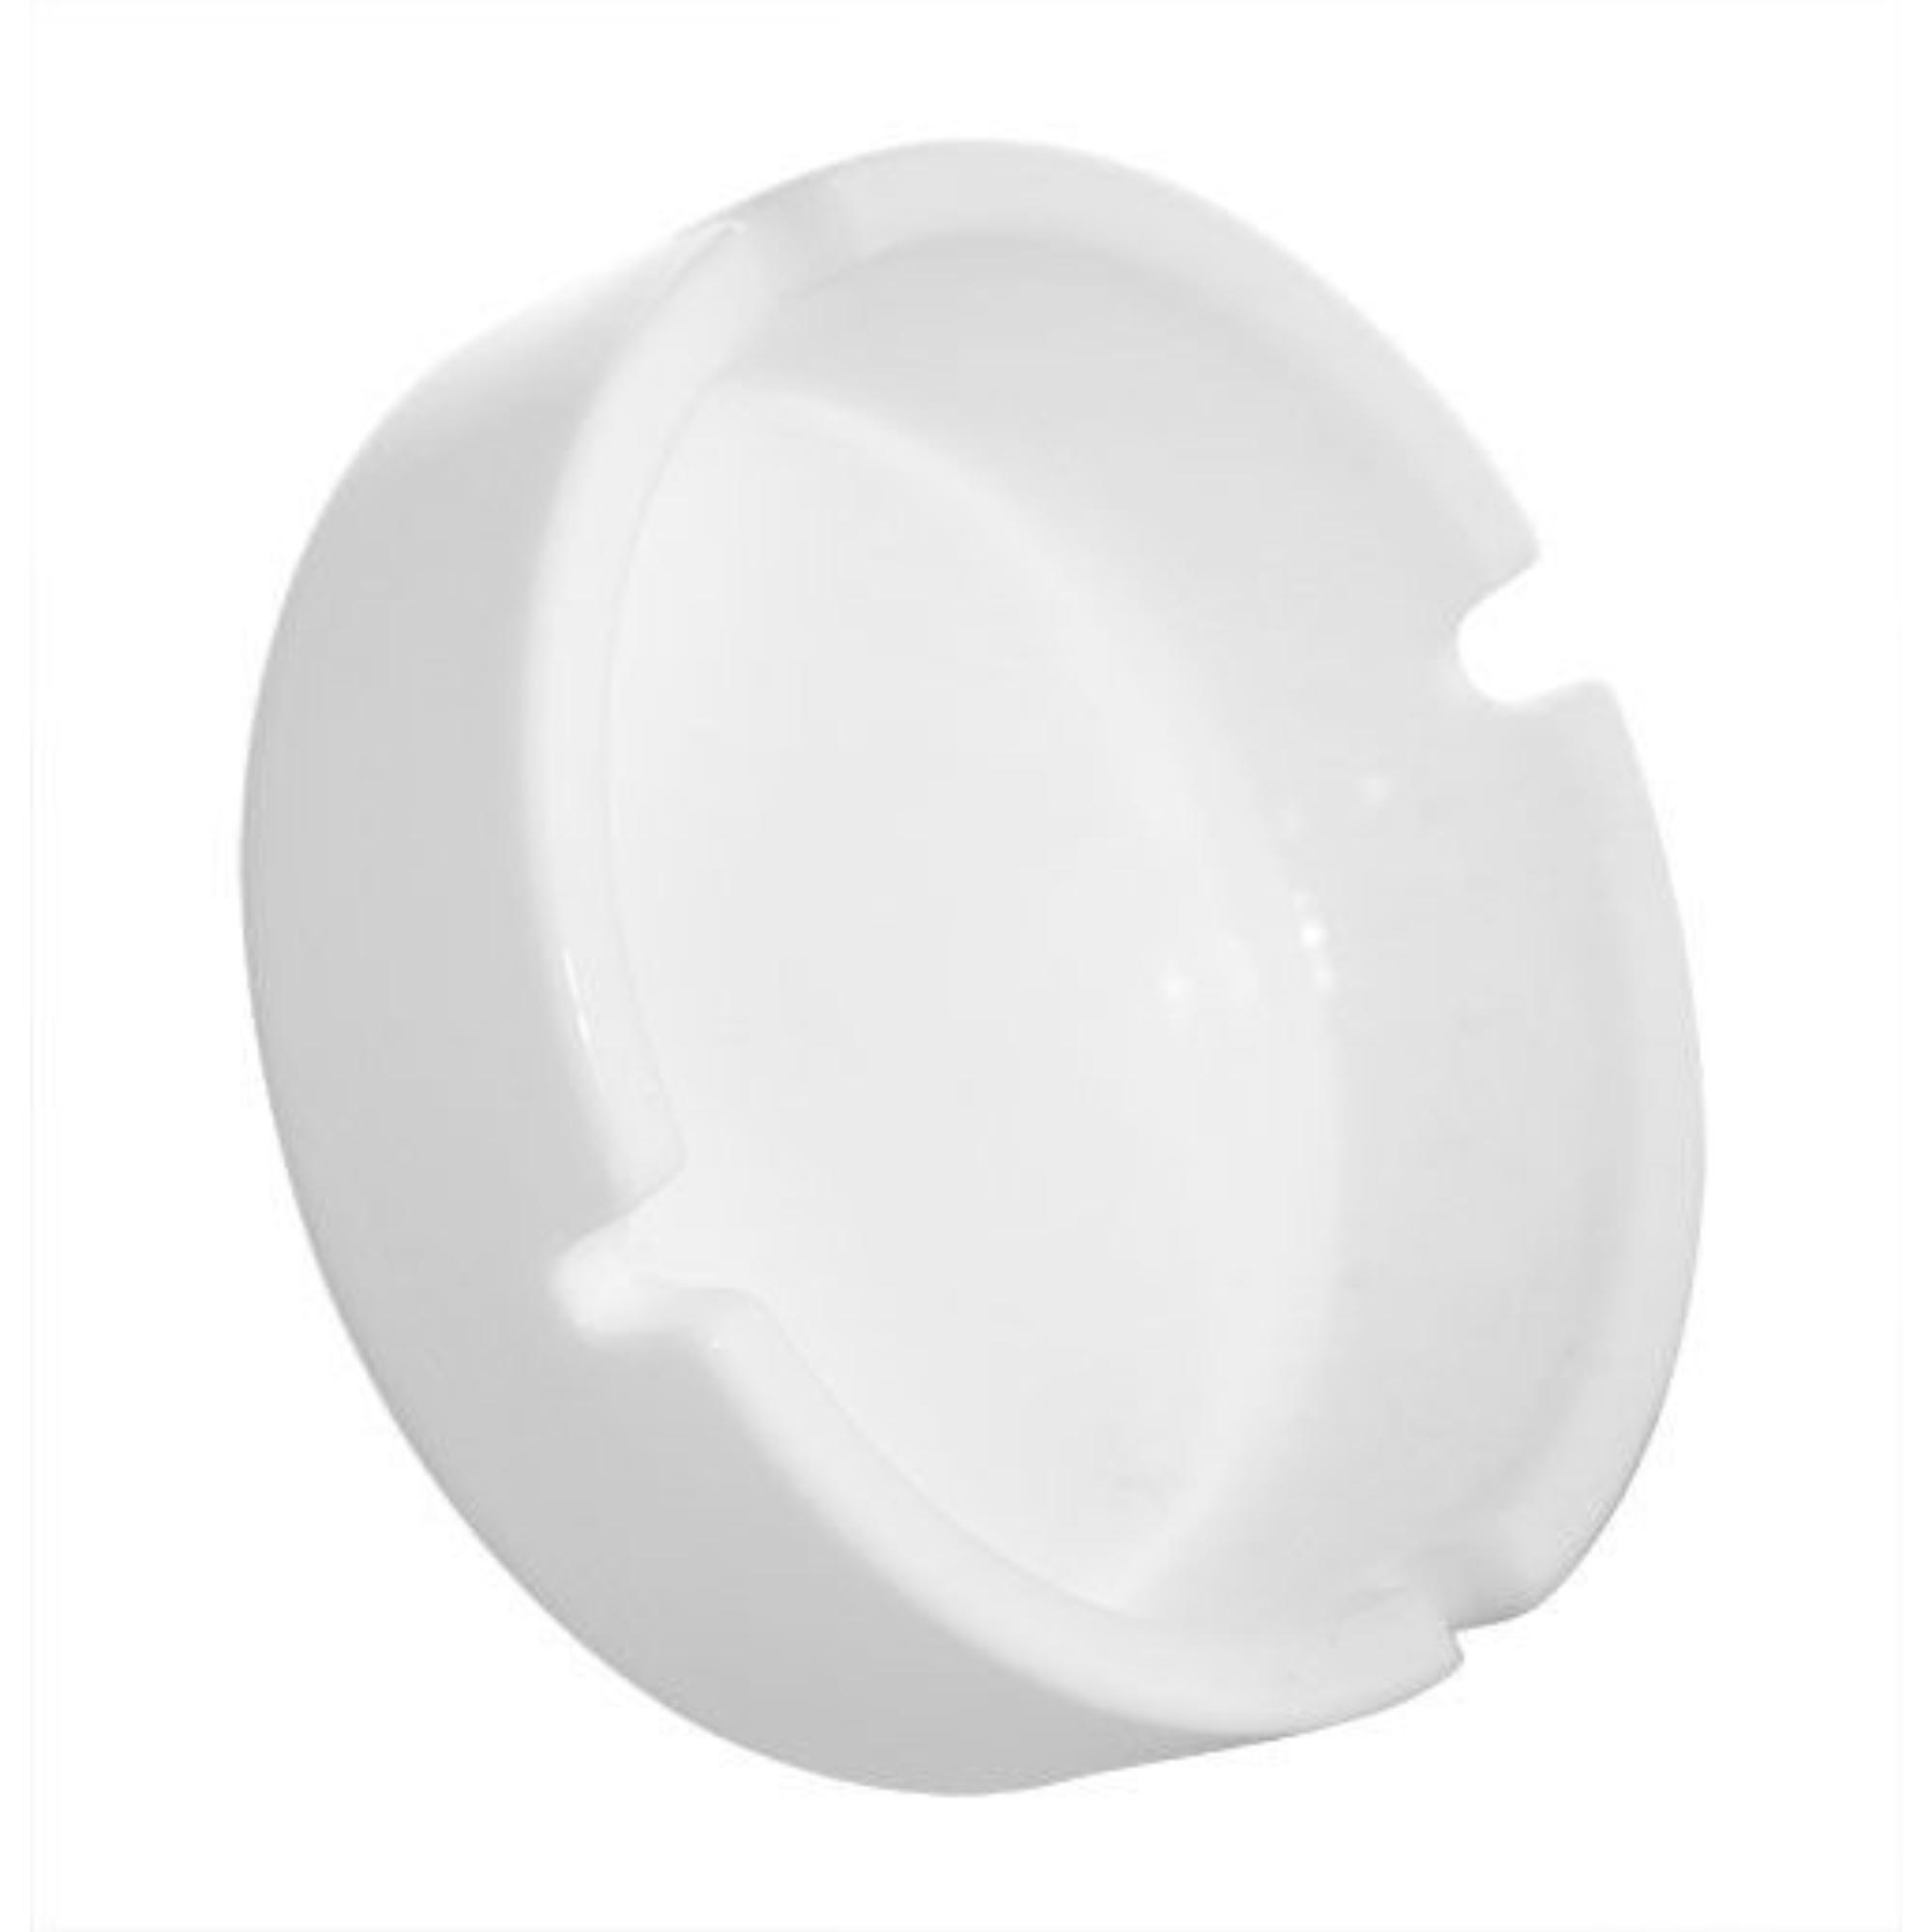 Witte Porselein Asbak - Doorsnede 10 cm.